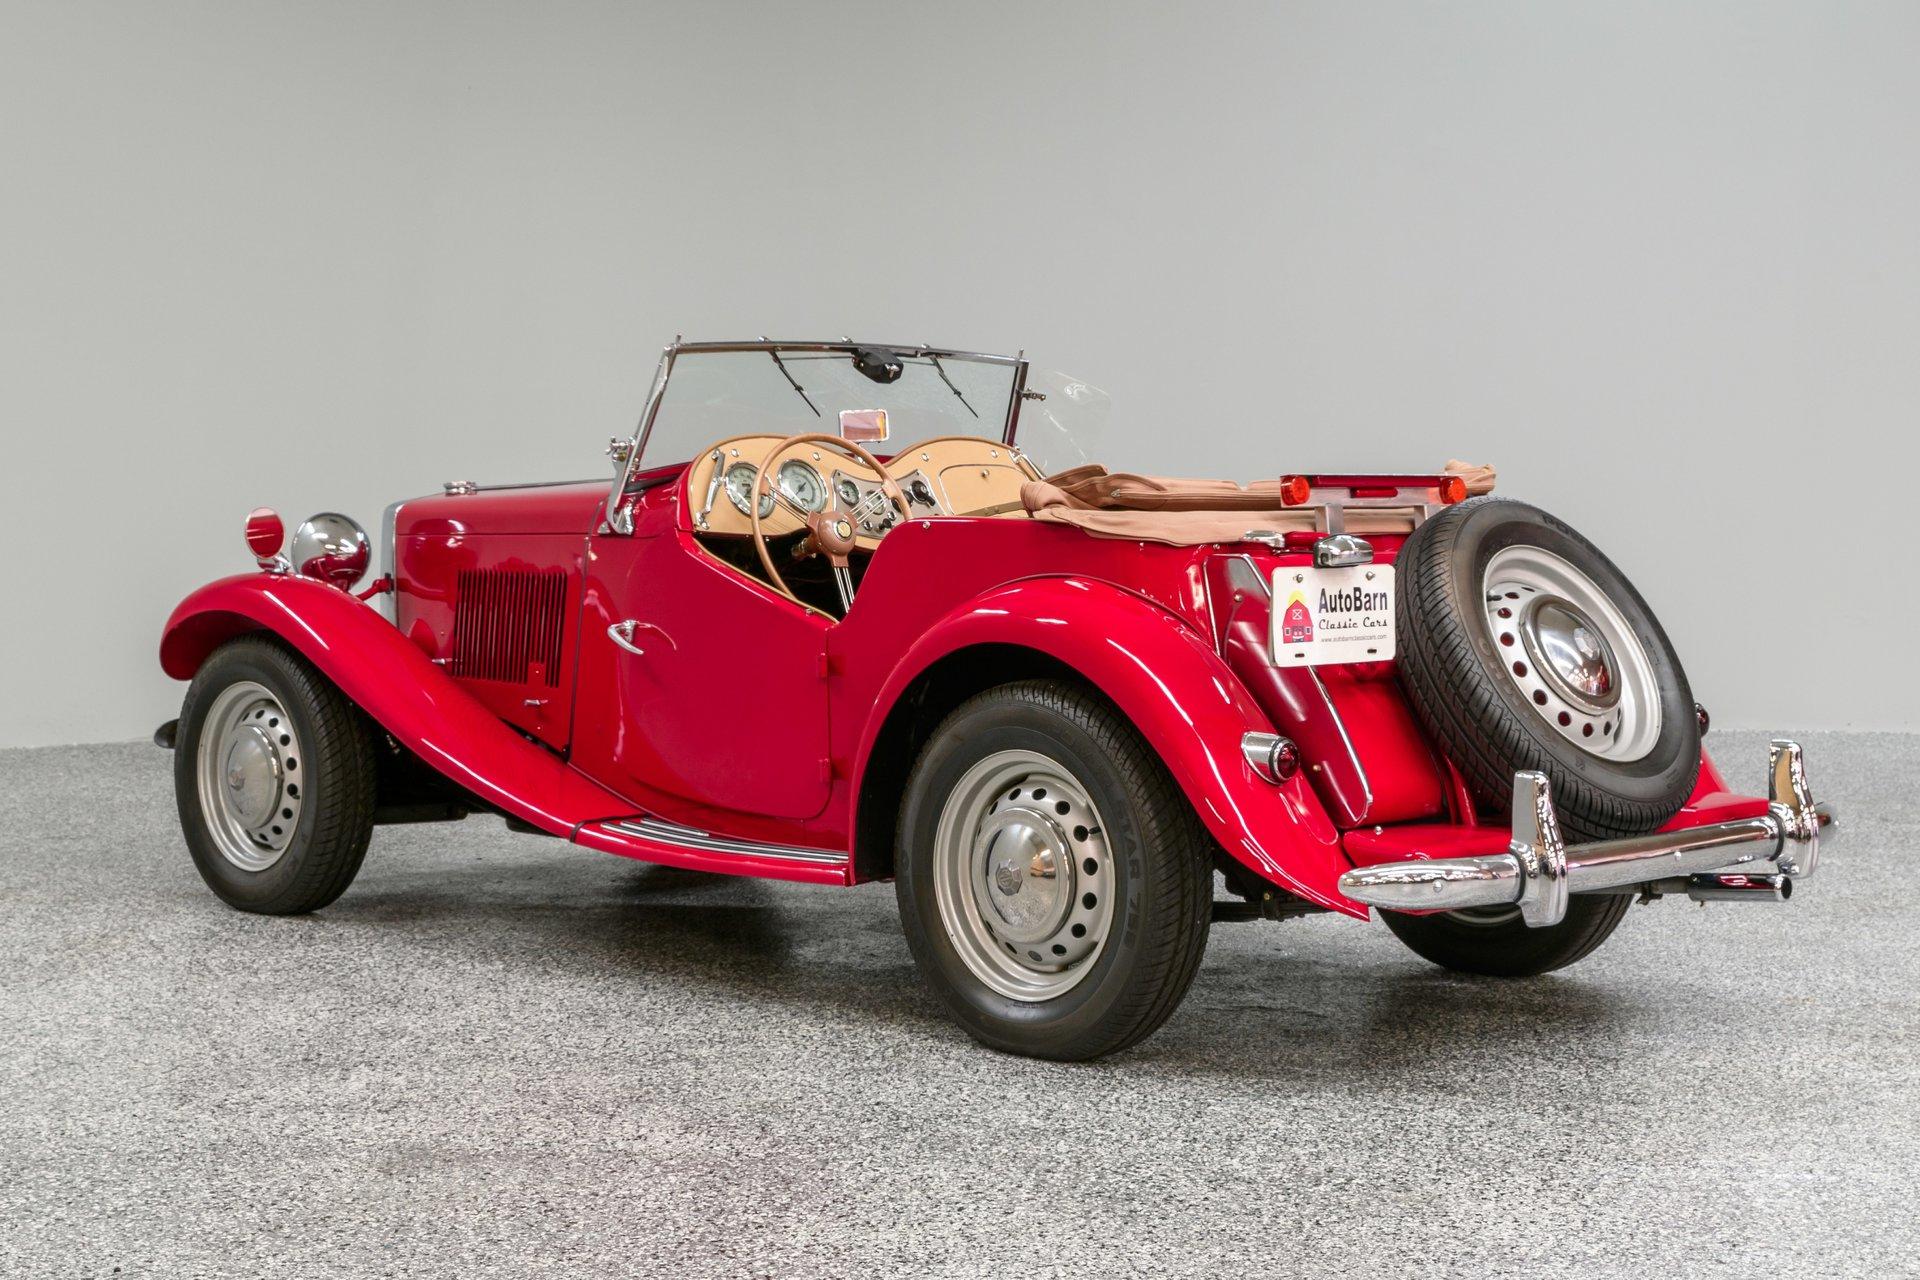 Remarkable 1953 Mg Td Auto Barn Classic Cars Wiring 101 Vihapipaaccommodationcom